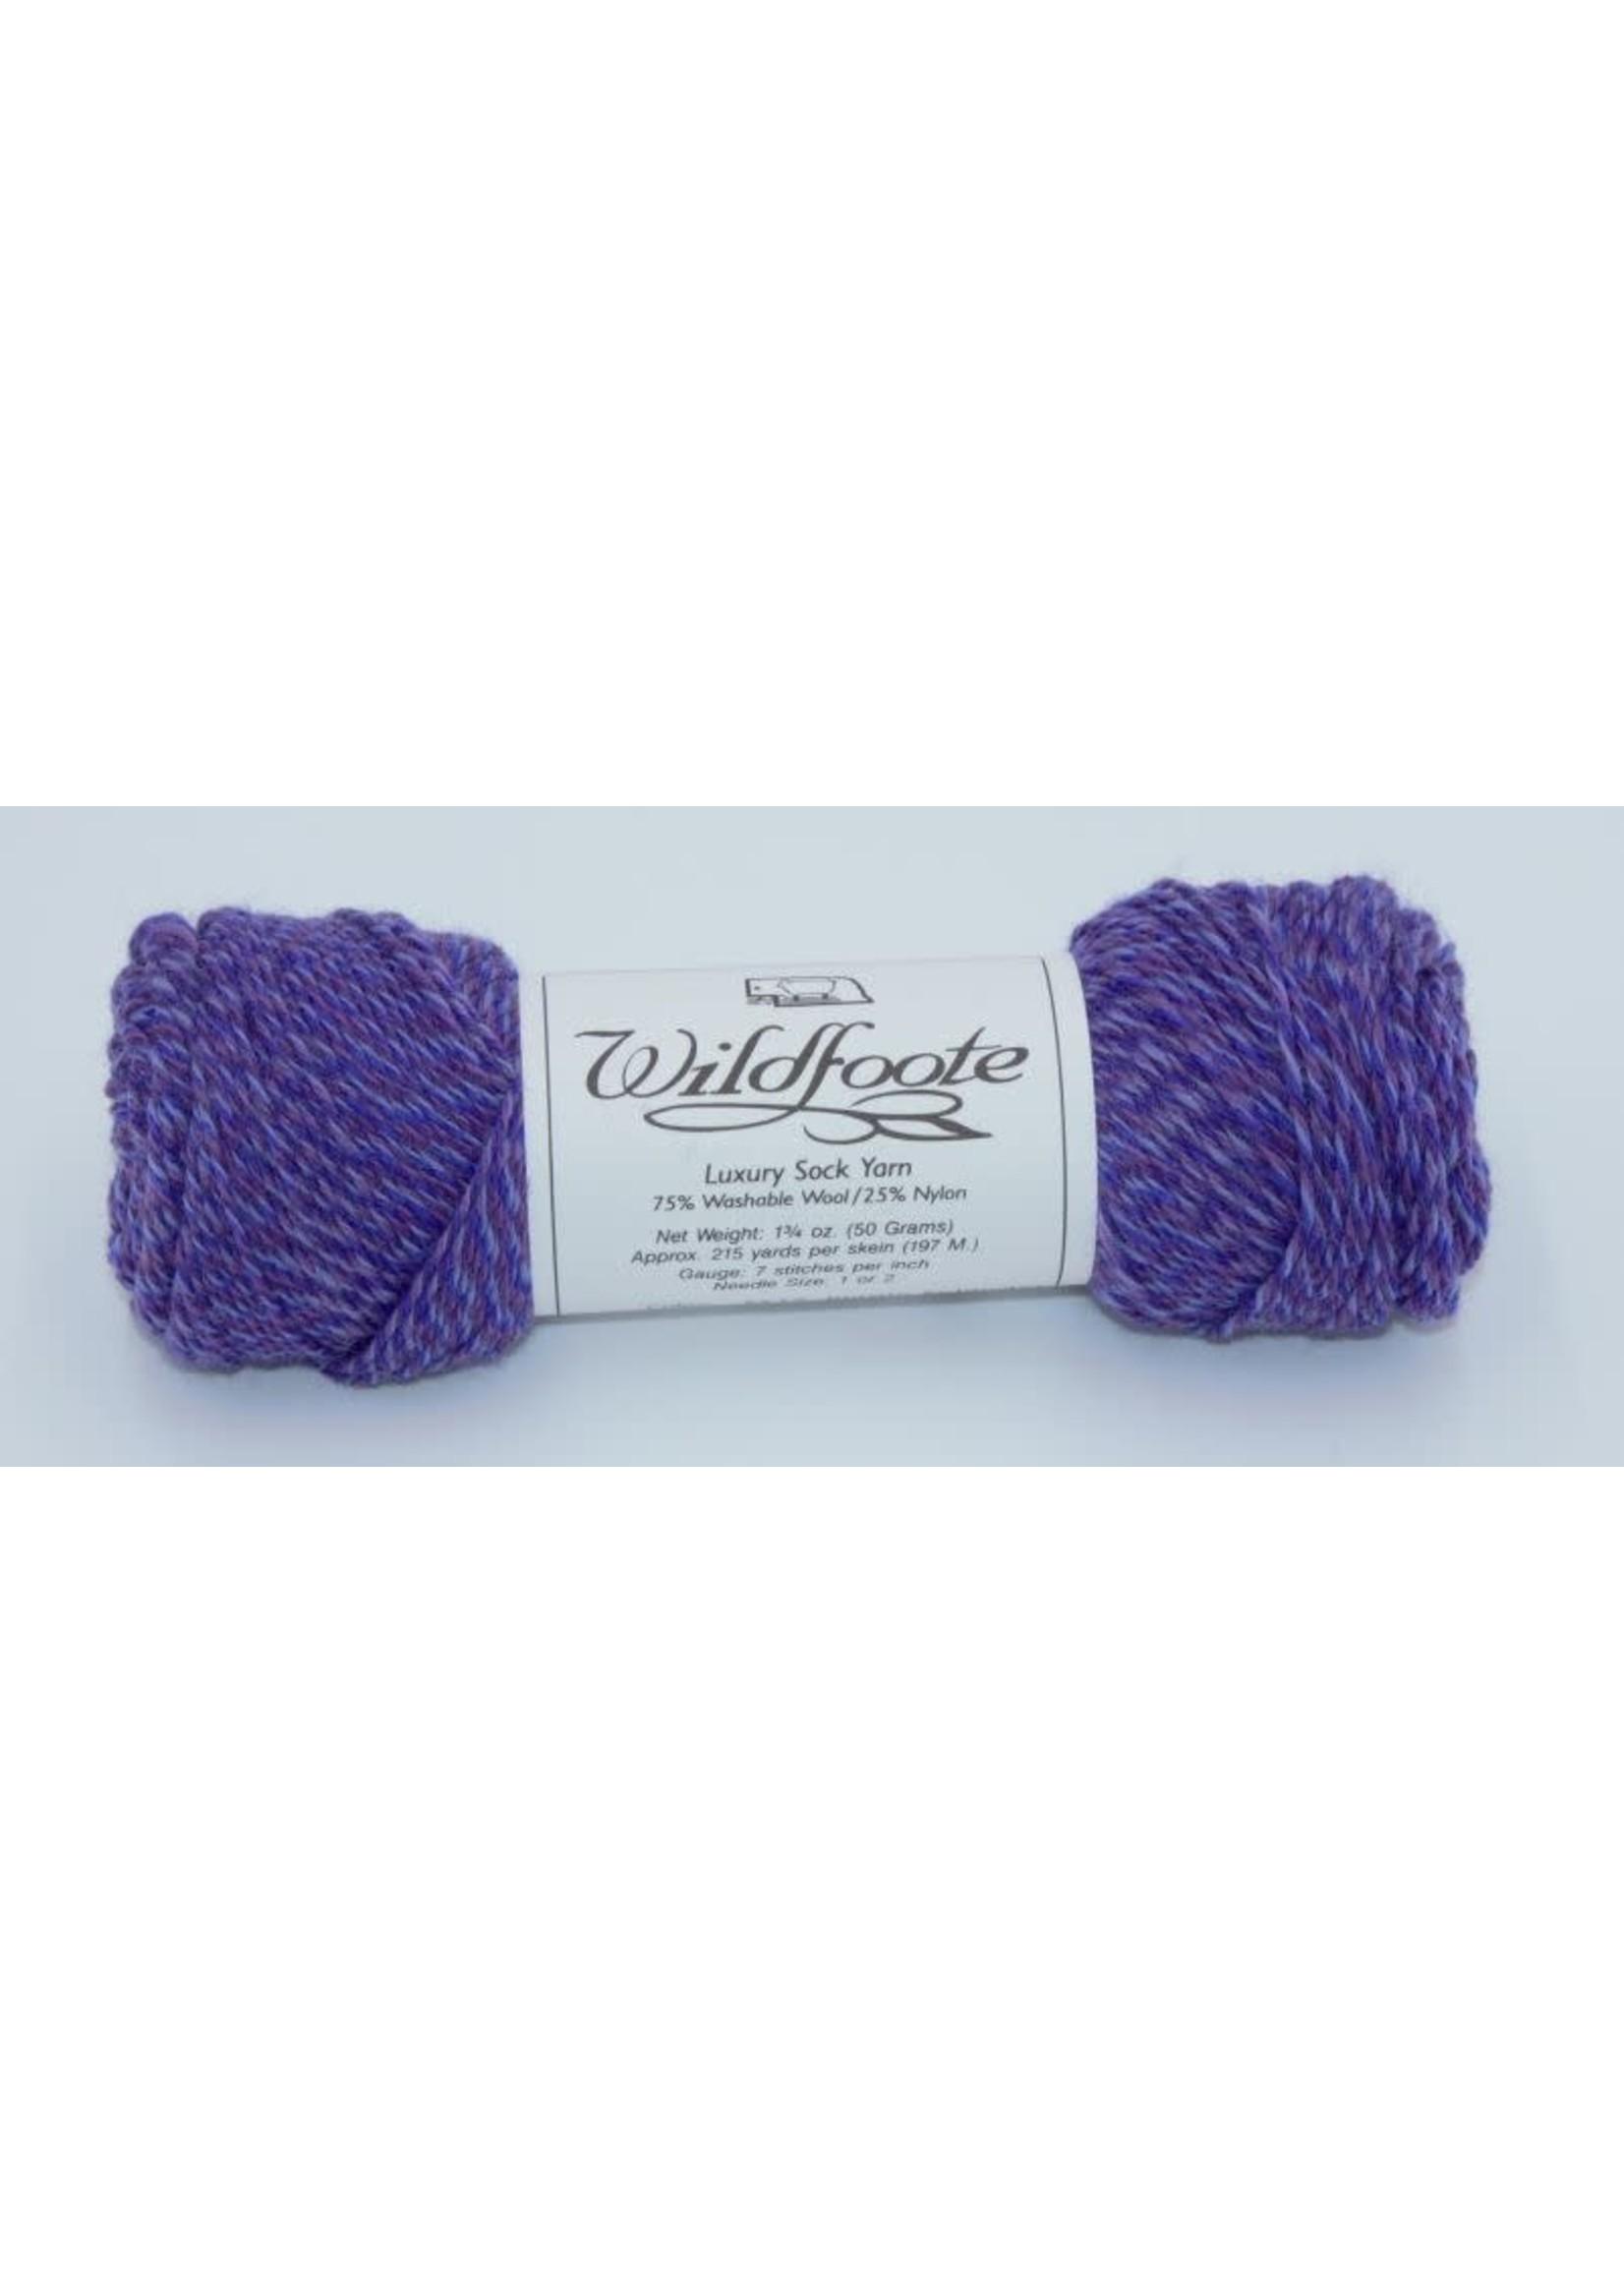 Brown Sheep Company Brown Sheep Wildfoote Sock Yarn